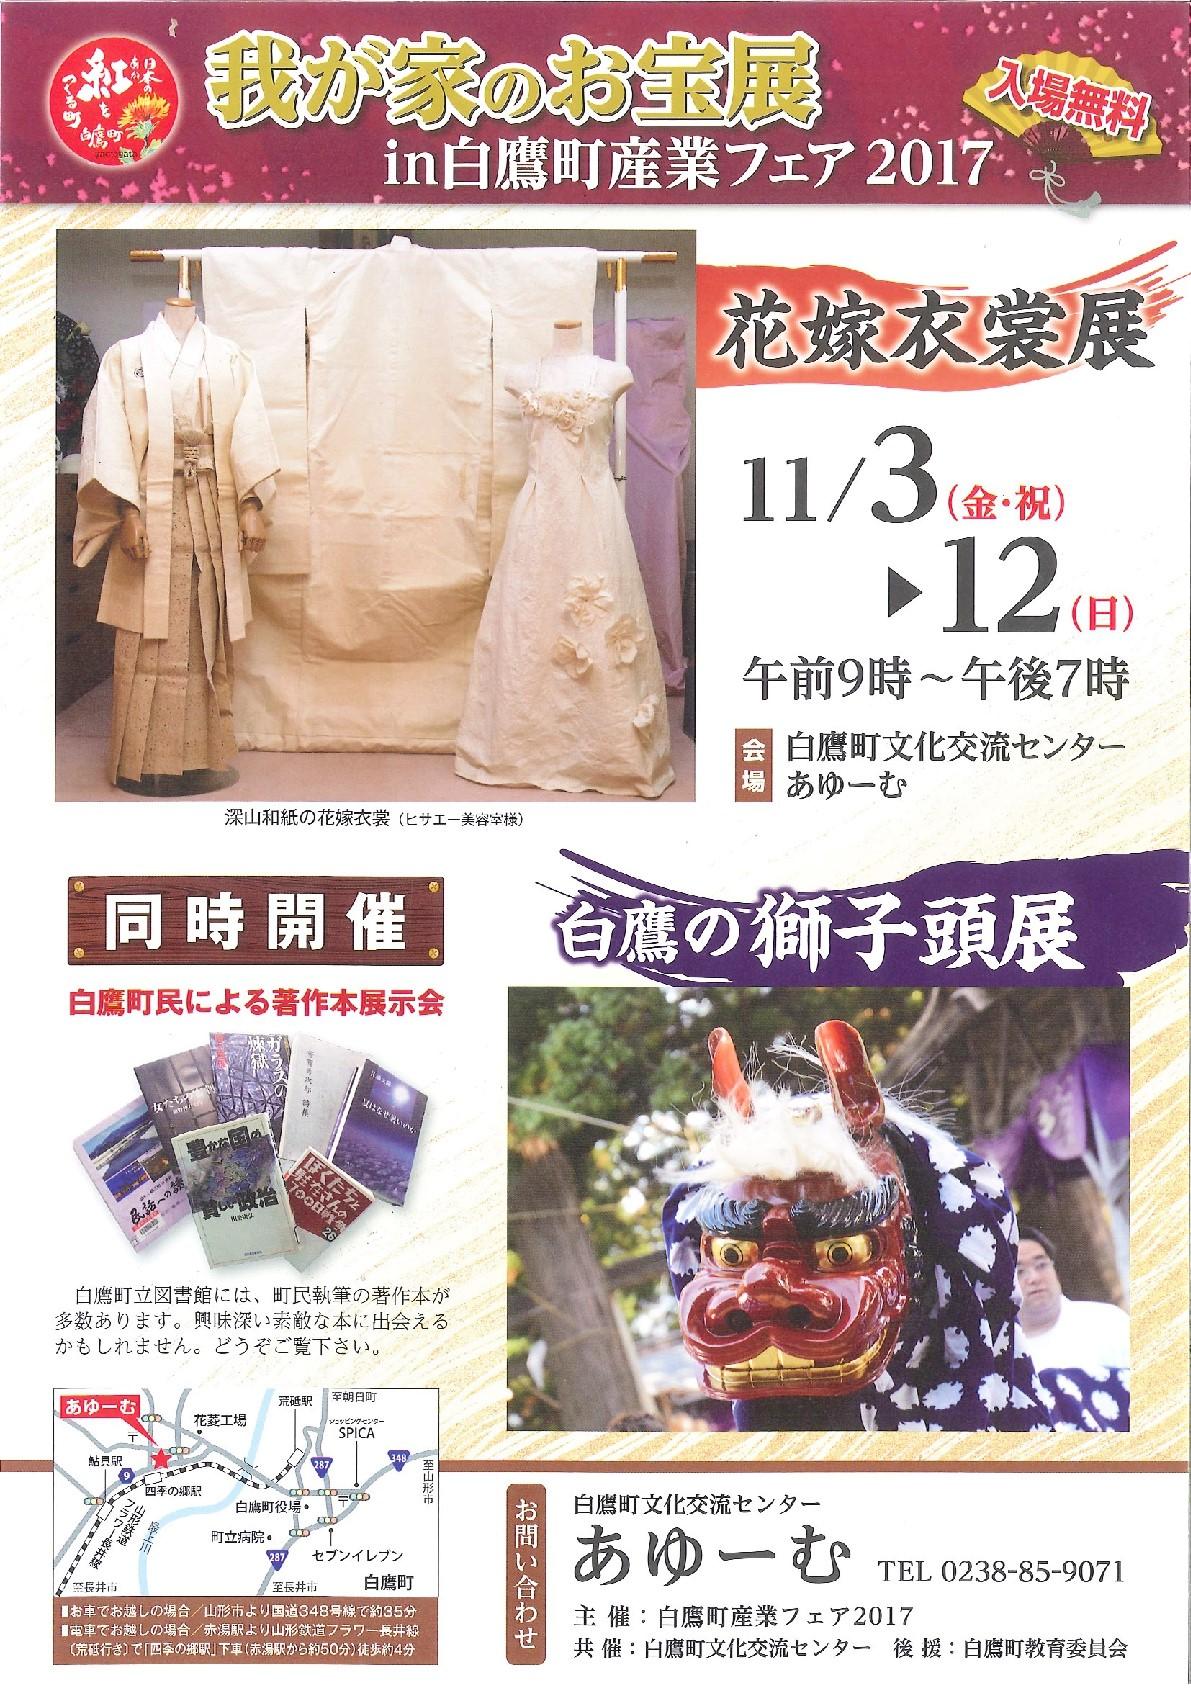 """Treasure exhibition in Shirataka-machi industry fair 2017 of my home:"" Image"